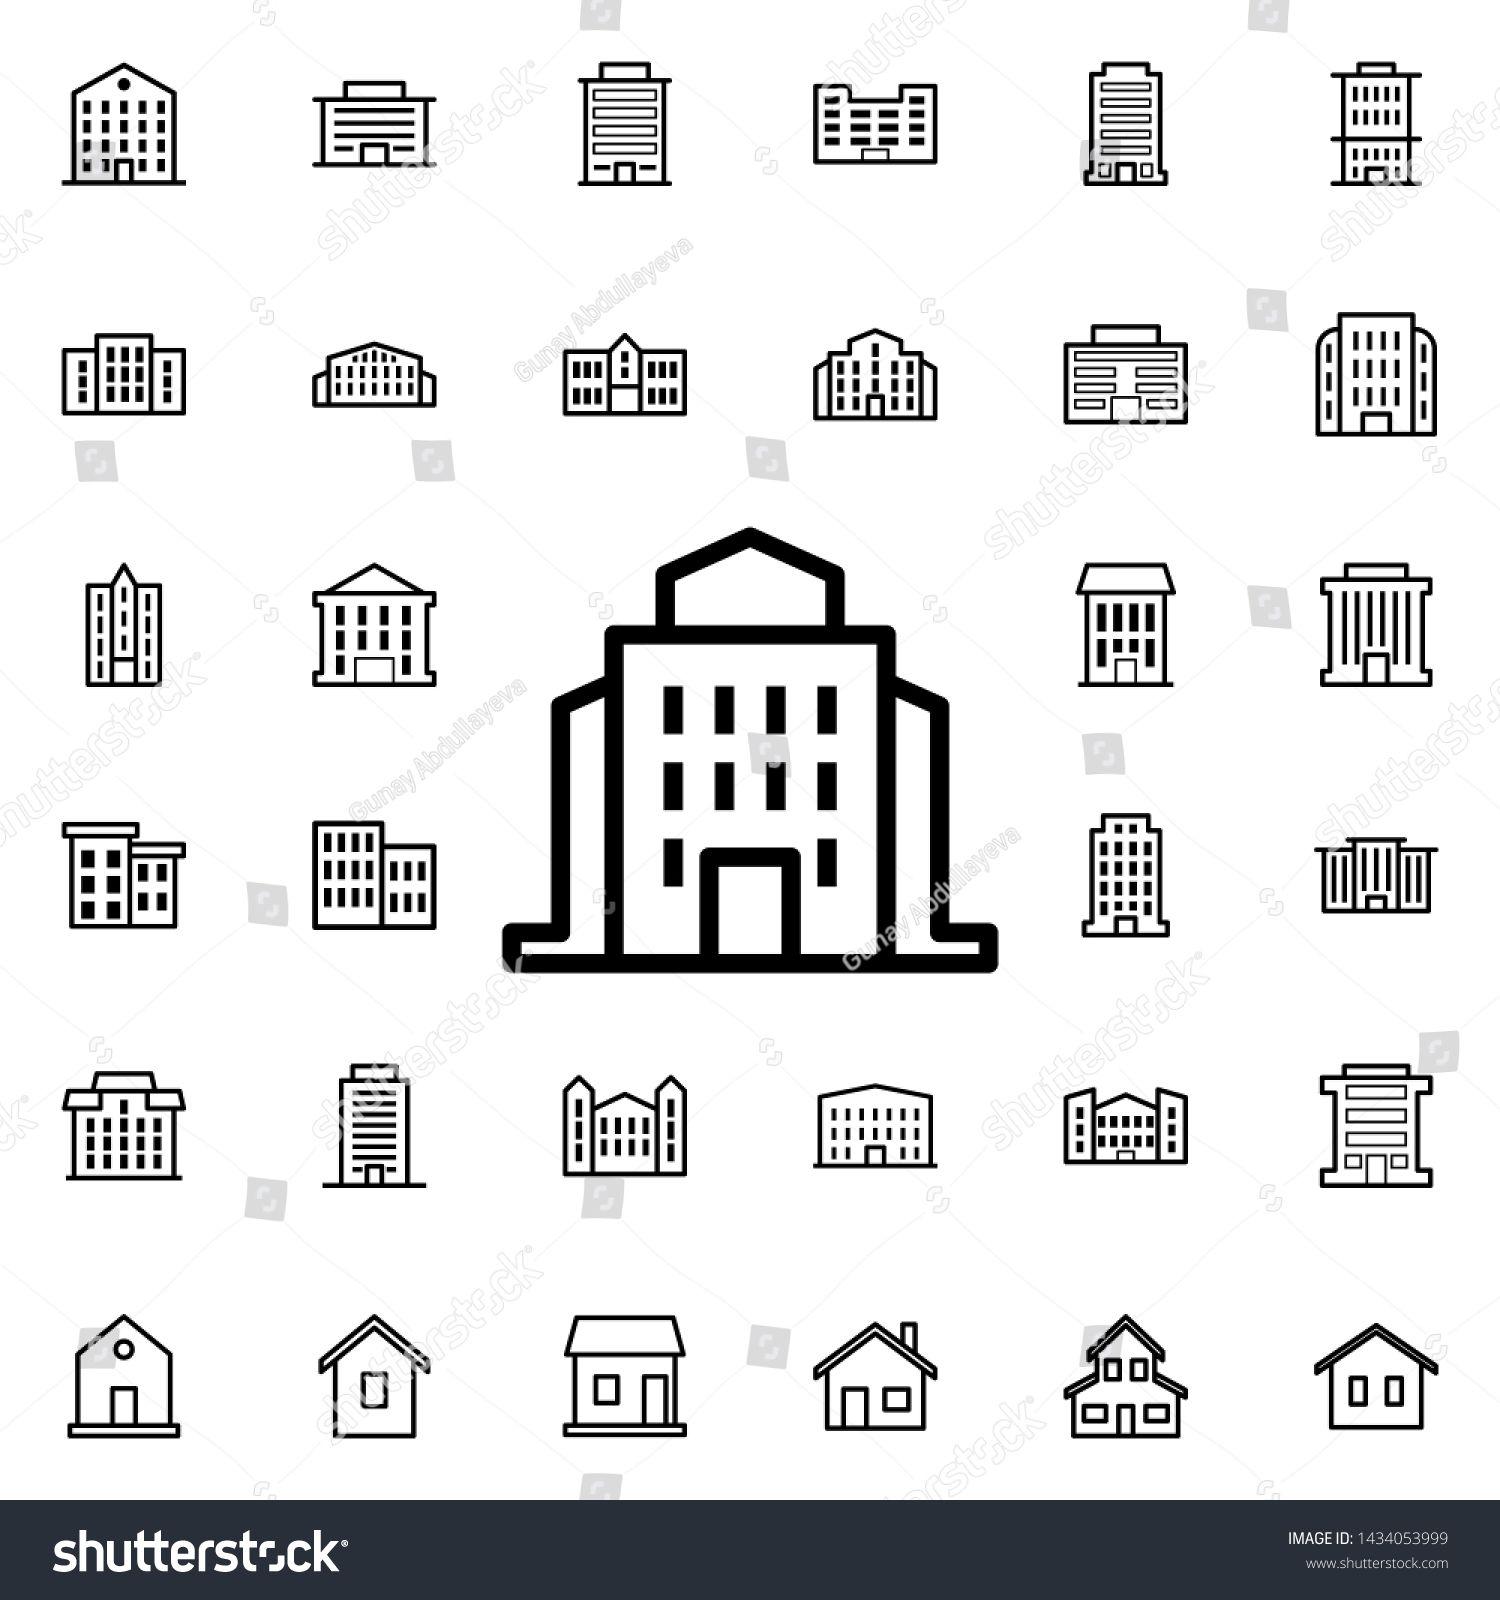 Public Institution Icon Universal Set Of Buildings For Website Design And Development App Developmen Photography Websites Design Building Icon Website Design [ 1600 x 1500 Pixel ]